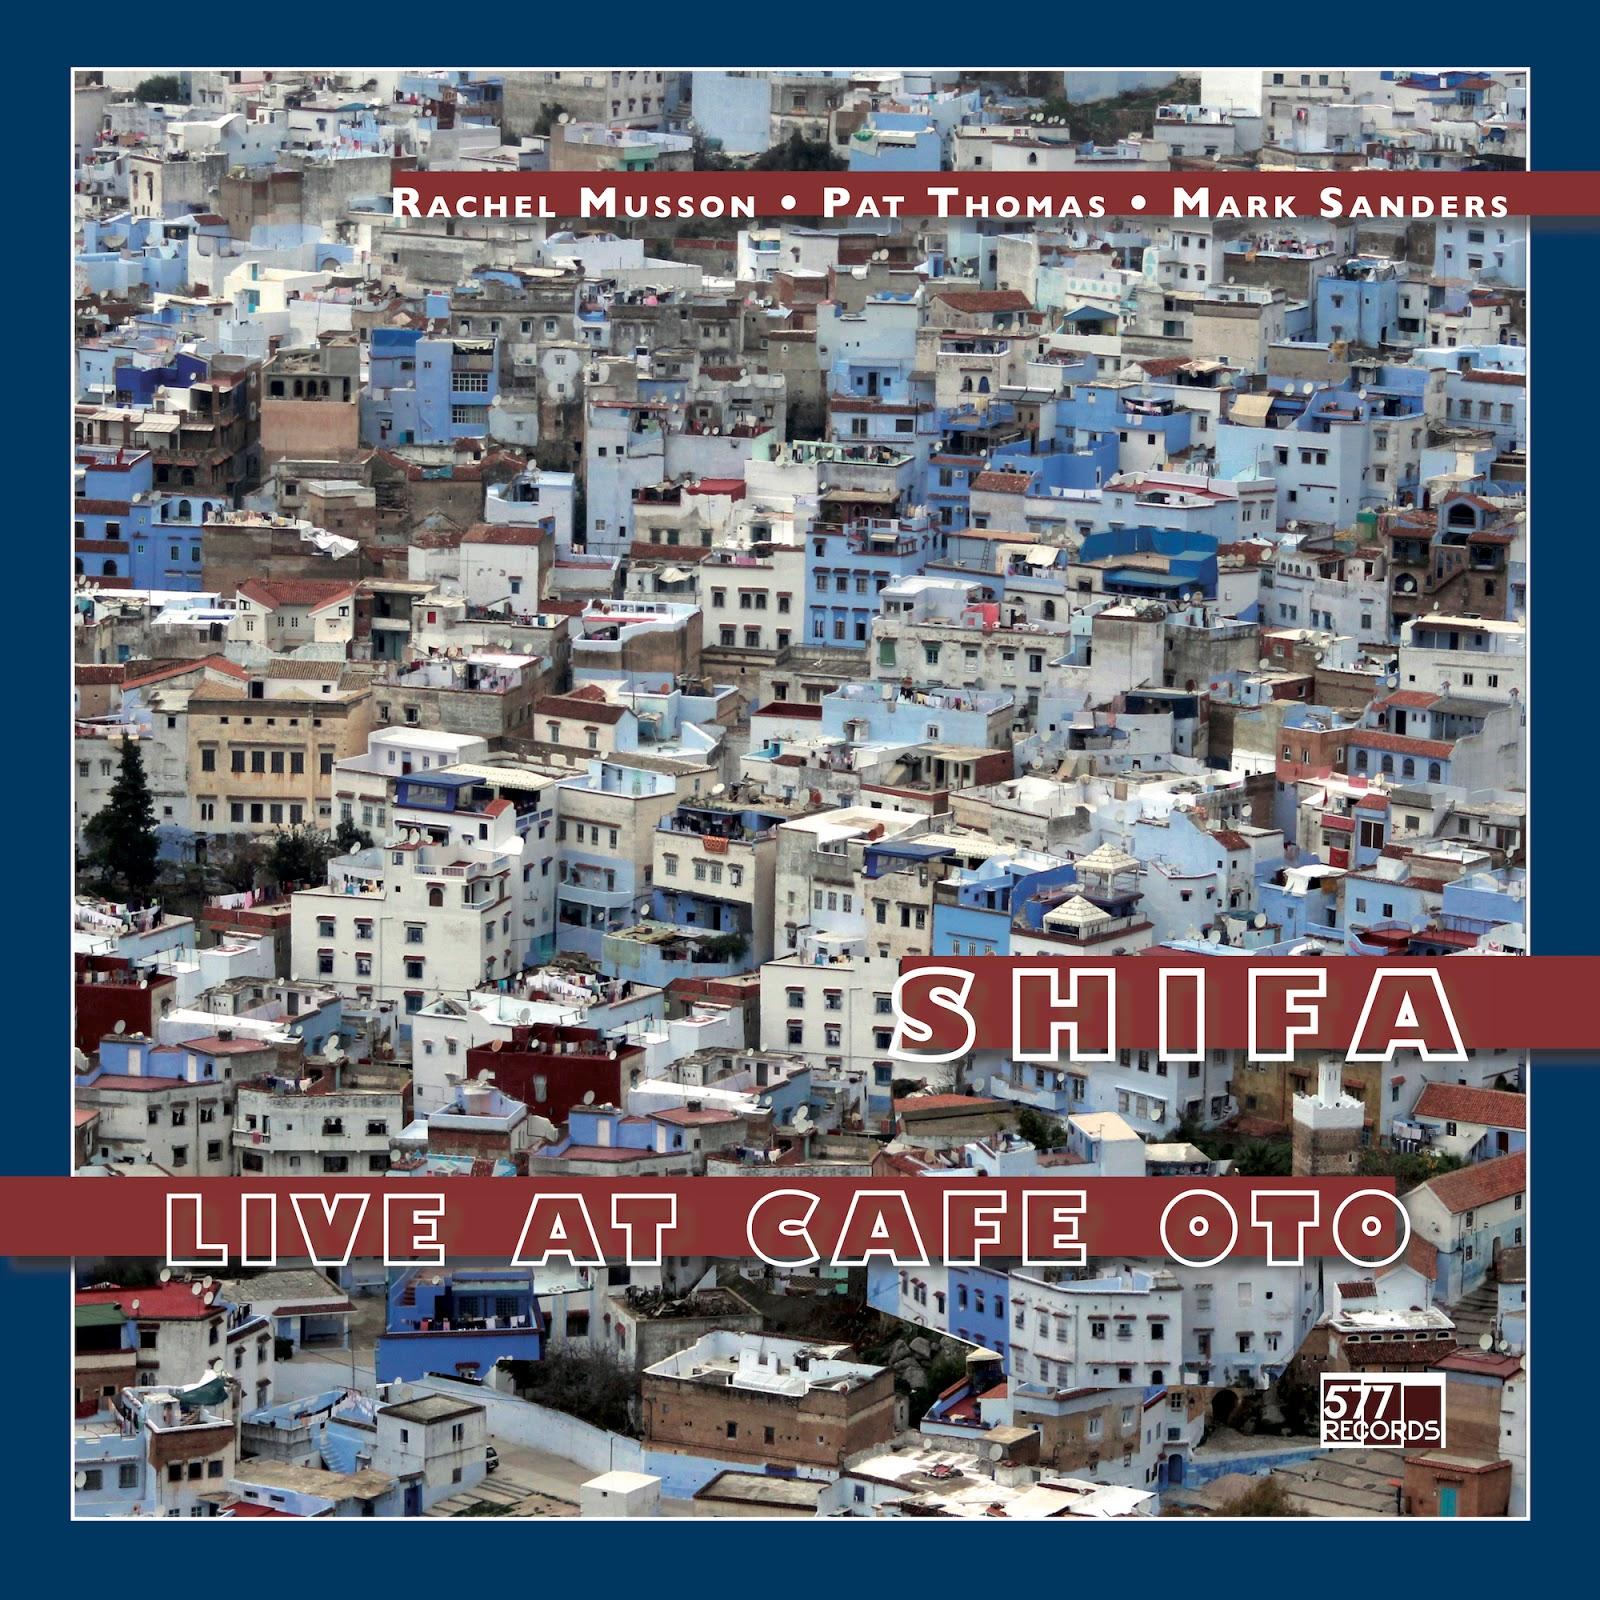 Rachel Musson / Pat Thomas / Mark Sanders - Shifa: Live at Cafe Oto